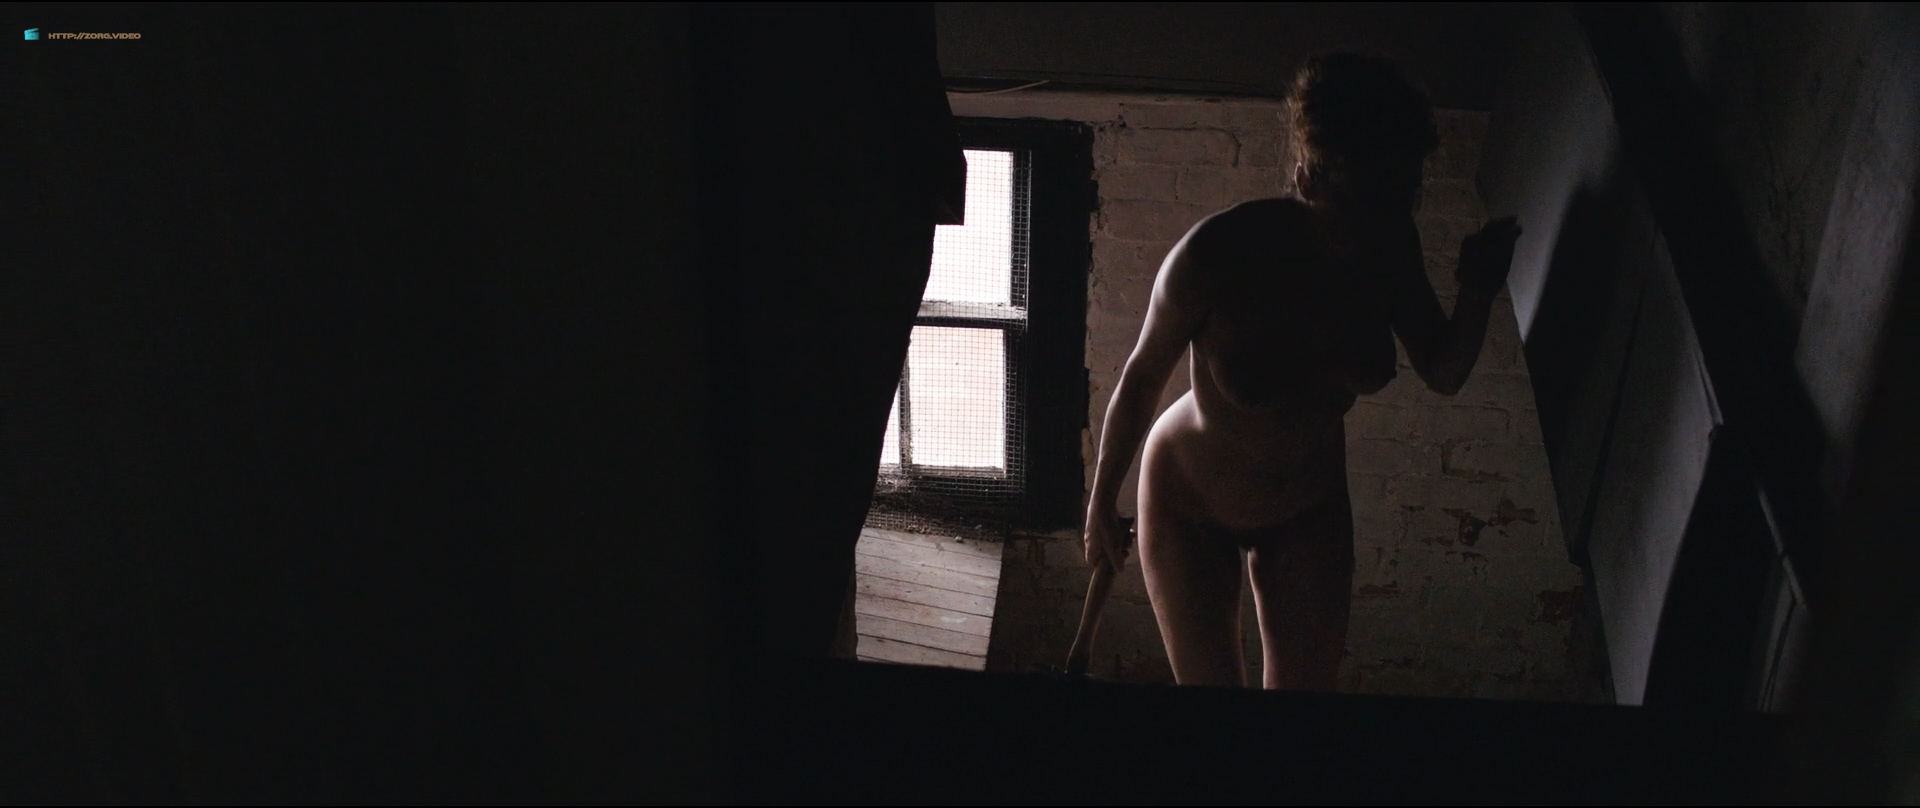 Kristen Stewart nude topless Chloe Sevigny nude topless and butt - Lizzie (2018) HD1080p BluRay (10)